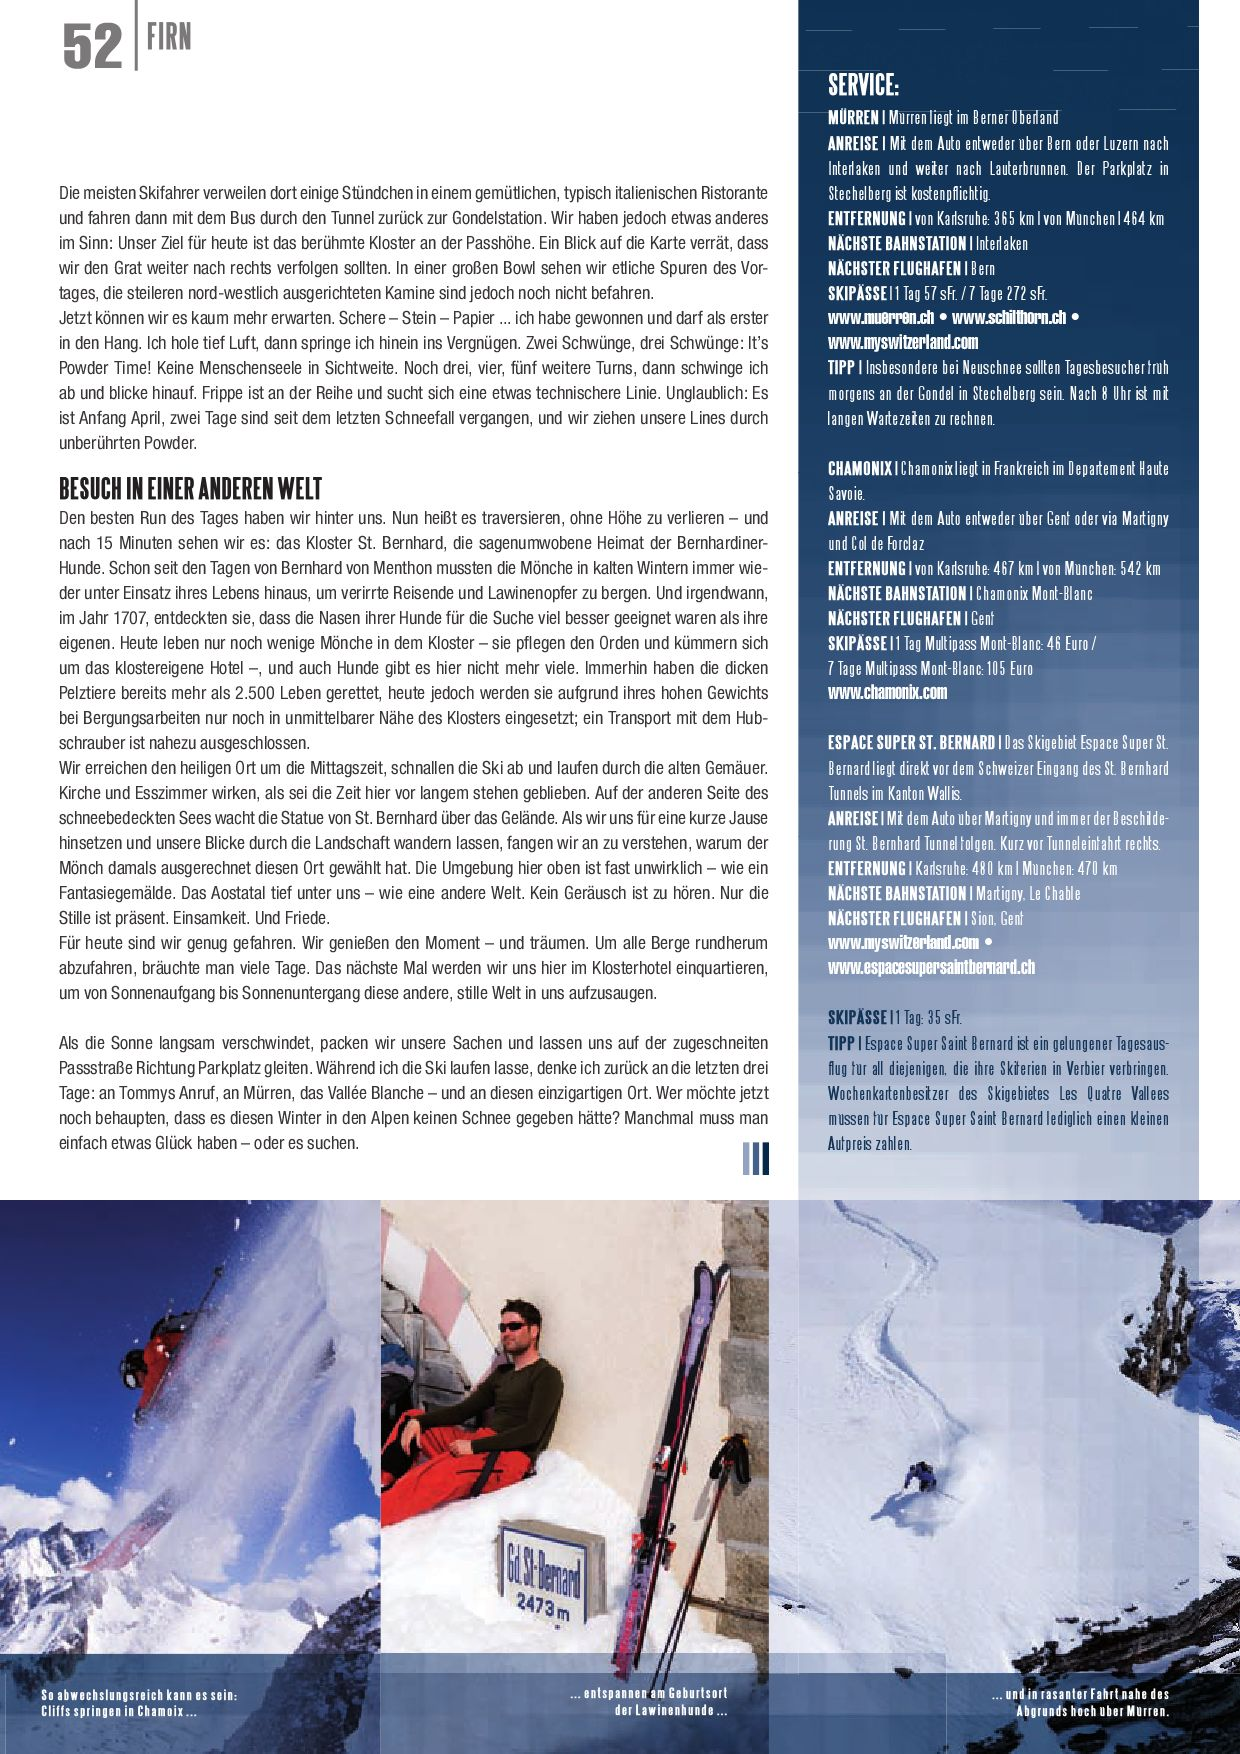 SkiPresse Nr. 10 by die denkbar Wolfgang Greiner issuu